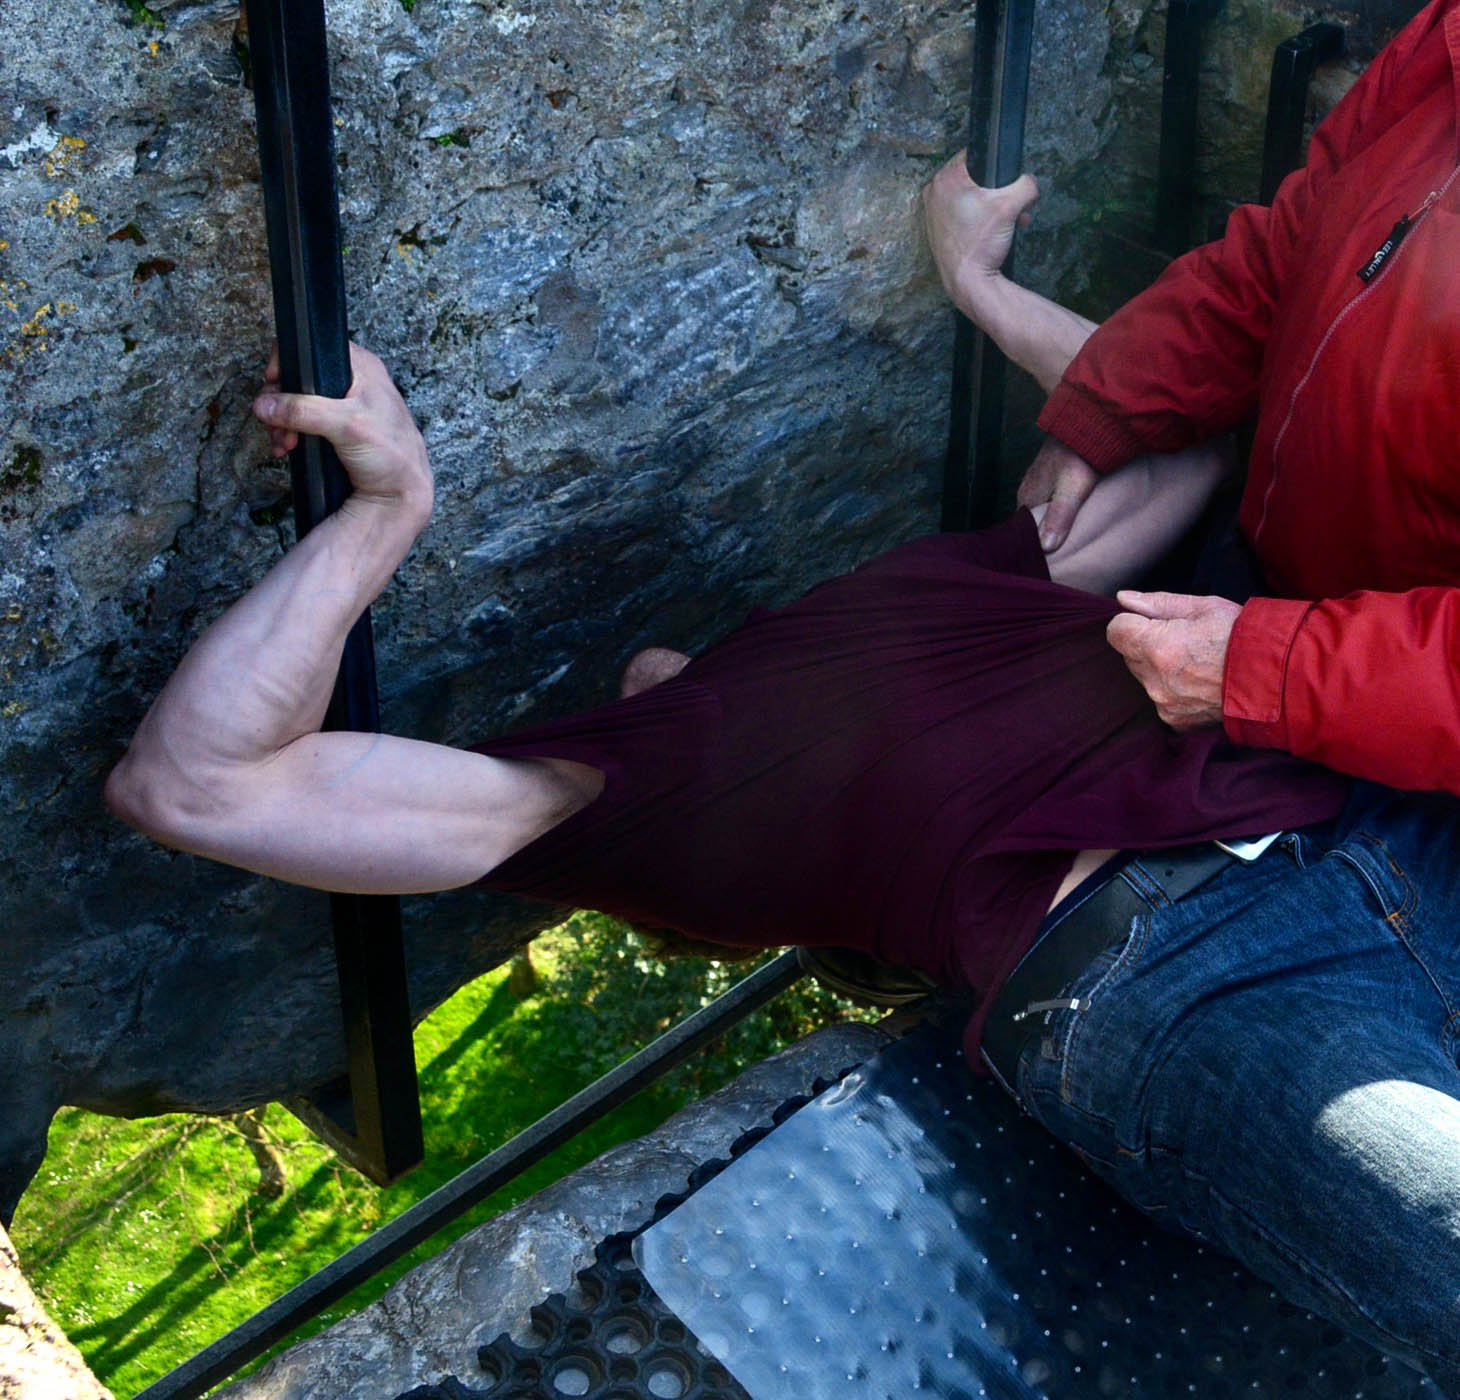 Blarney Castle Ryan kissing the Blarney Stone